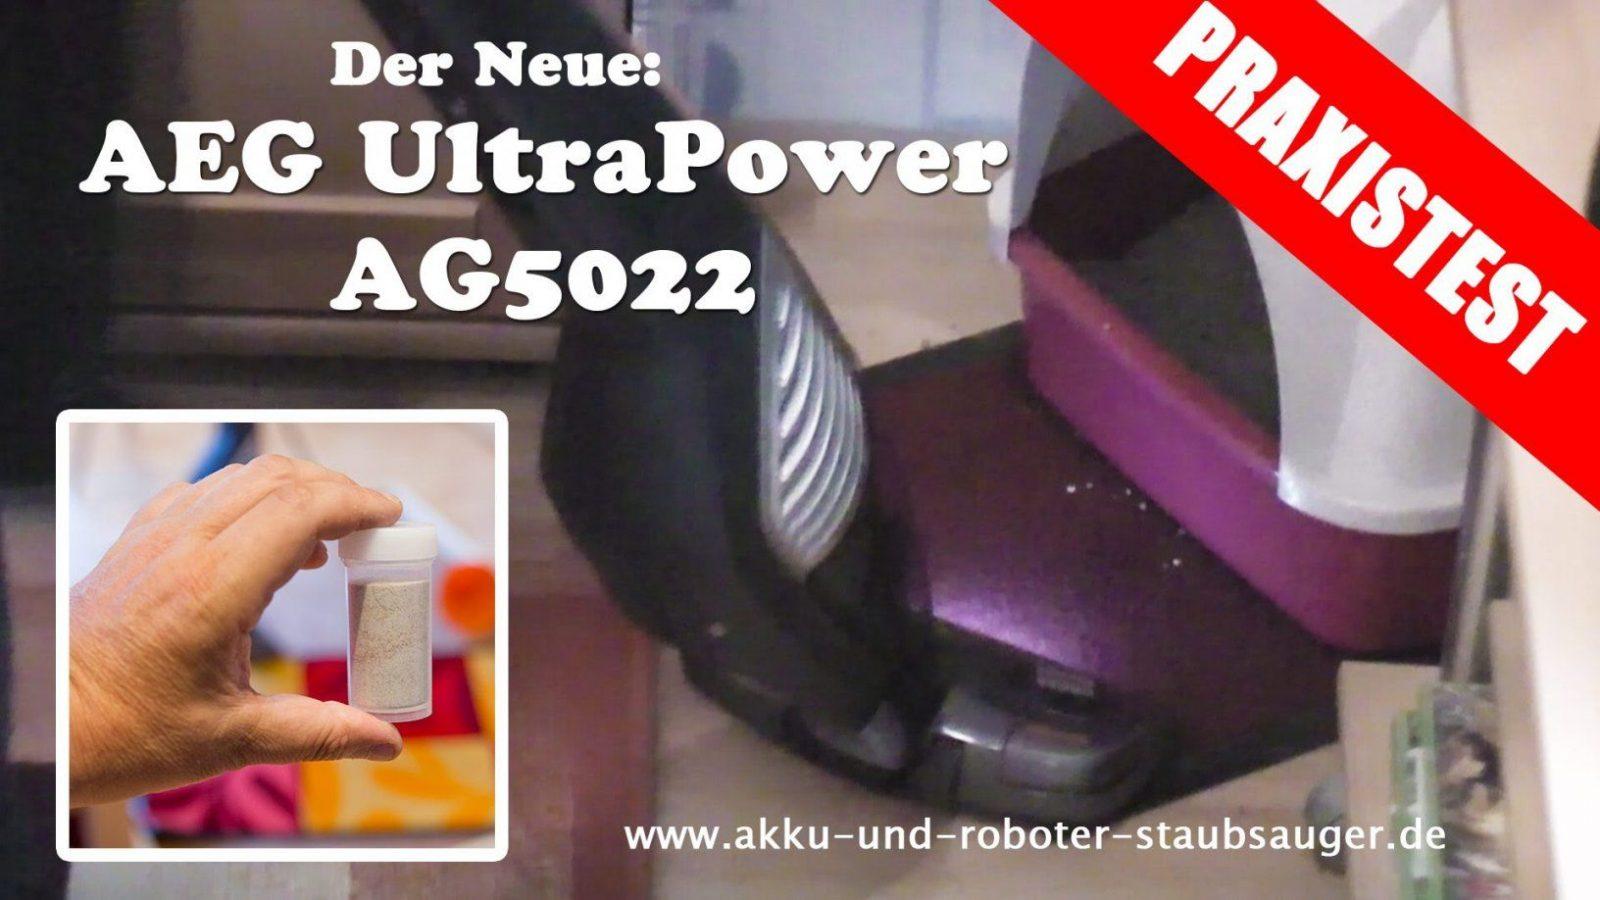 aeg li60 ultrapower ag 5022 im test praxistest youtube von. Black Bedroom Furniture Sets. Home Design Ideas